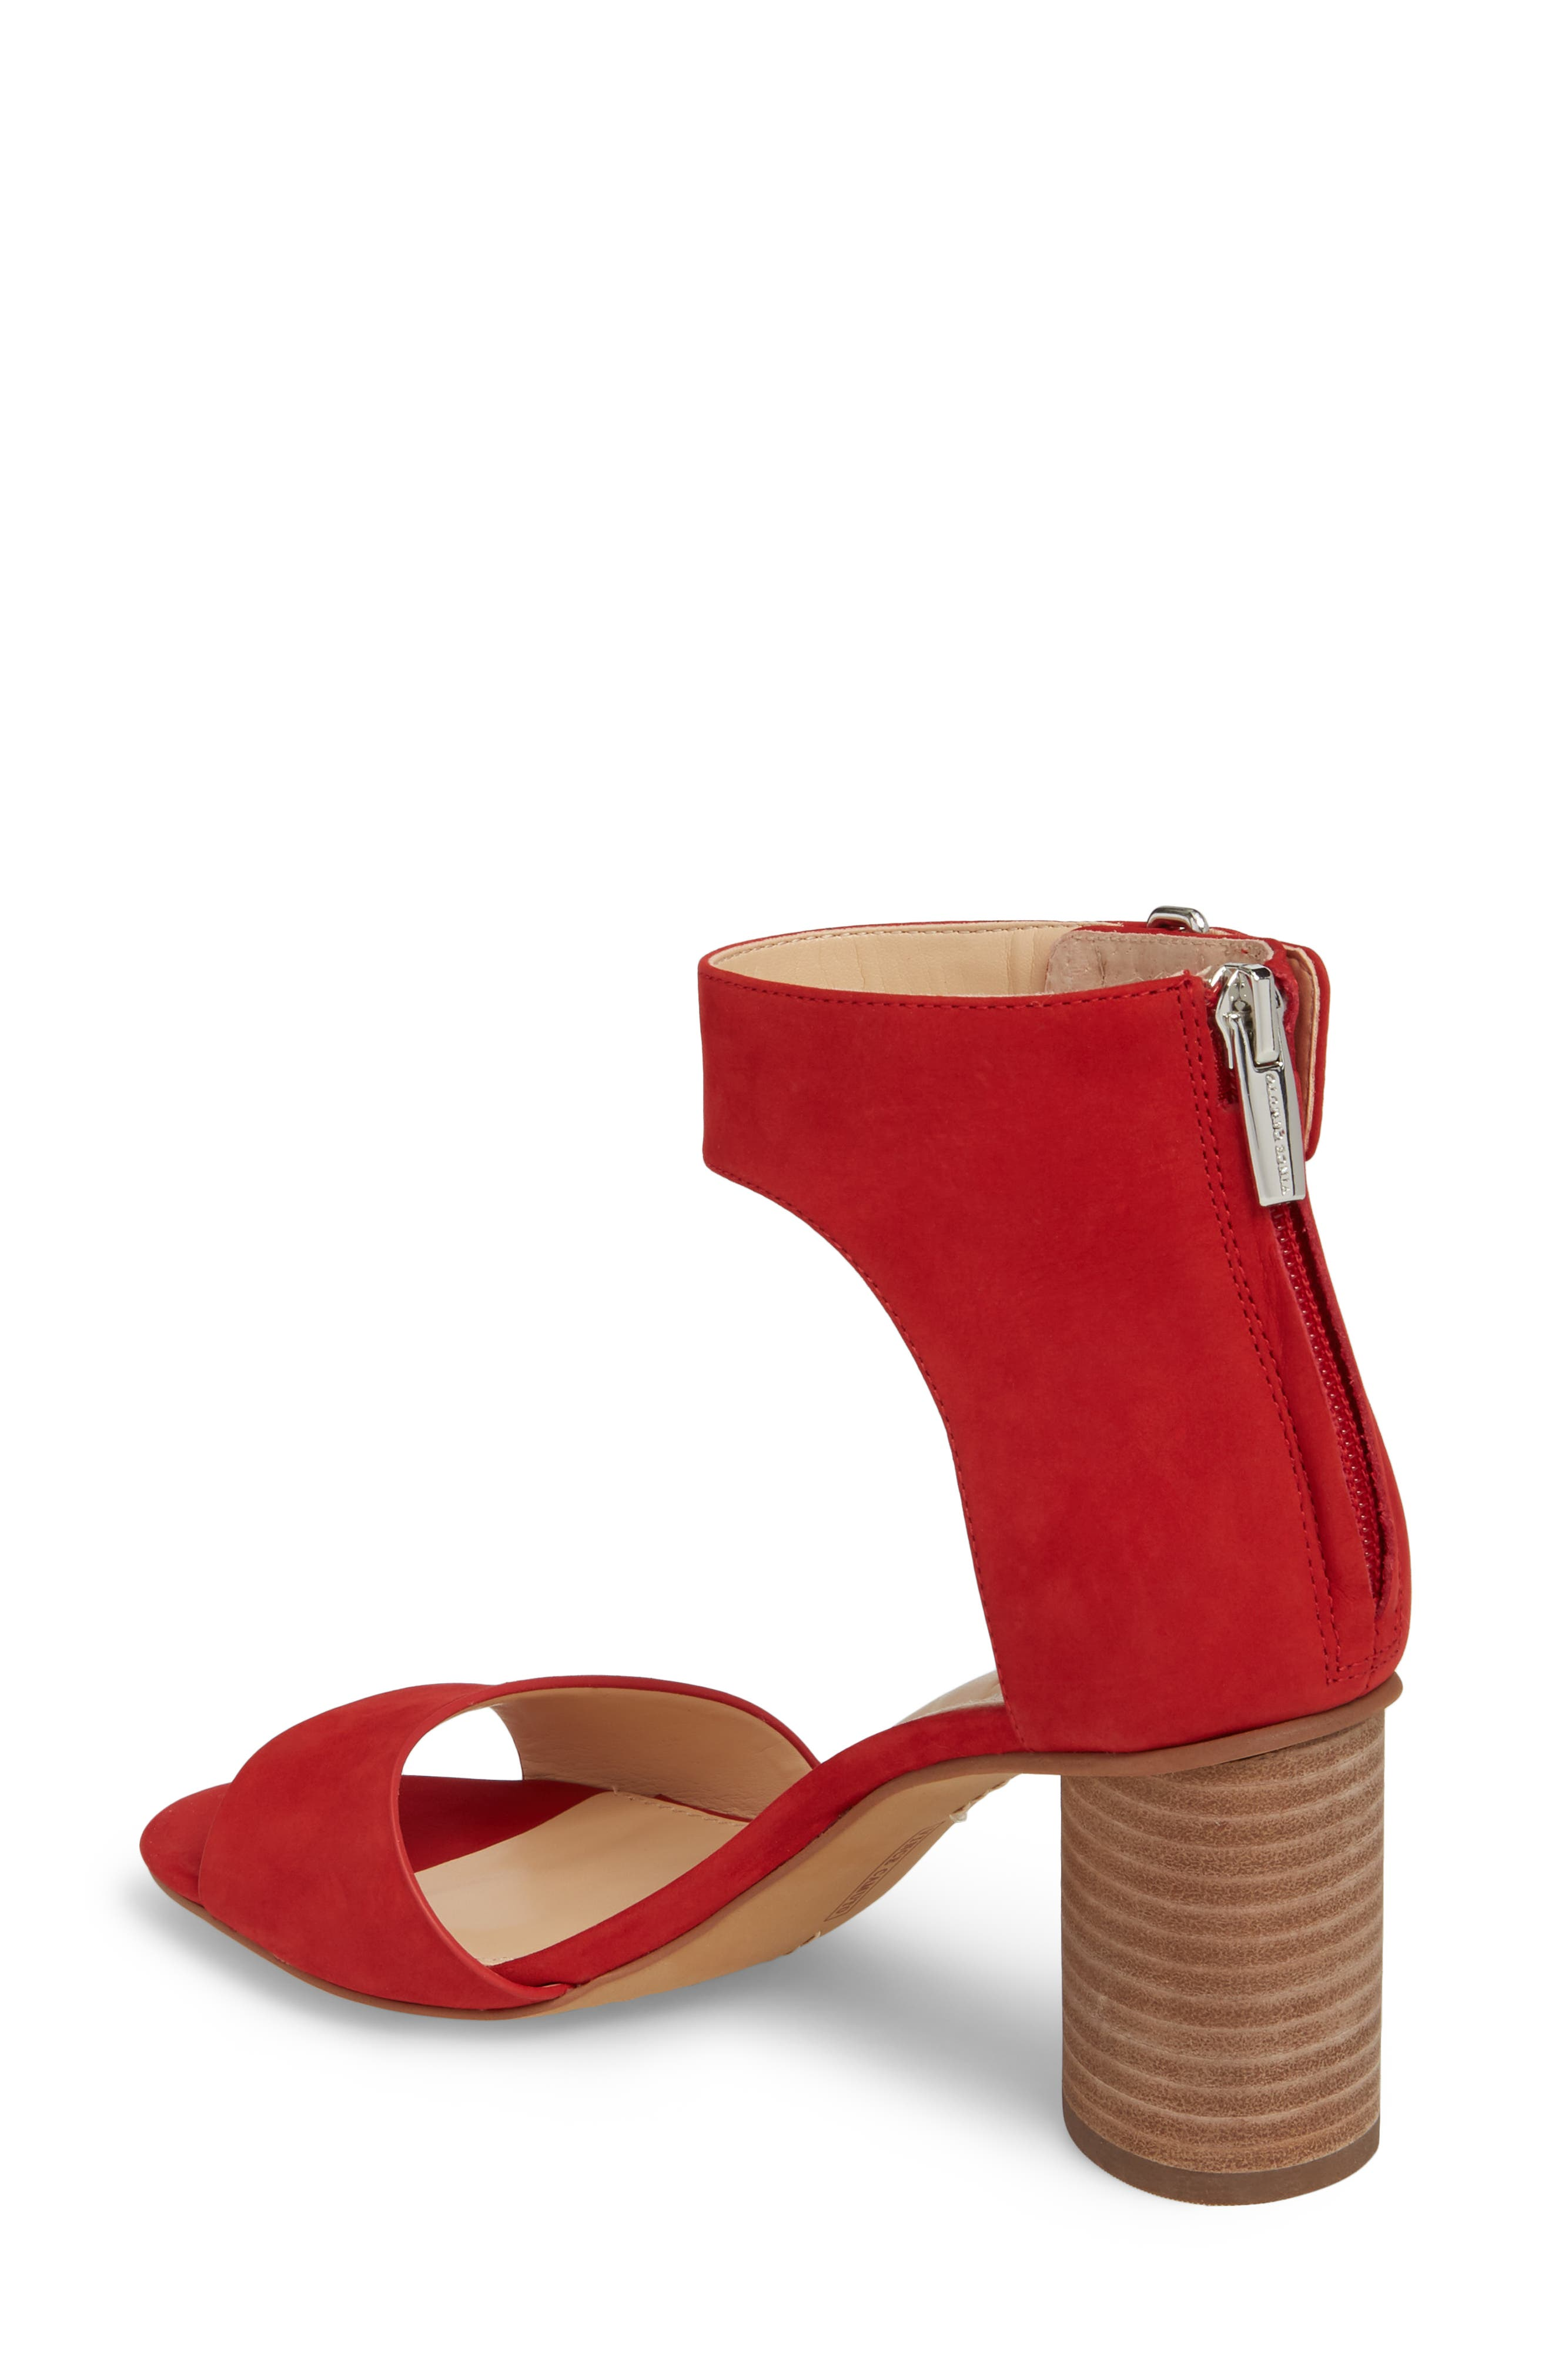 Jannali Ankle Strap Sandal,                             Alternate thumbnail 2, color,                             Cherry Red Leather